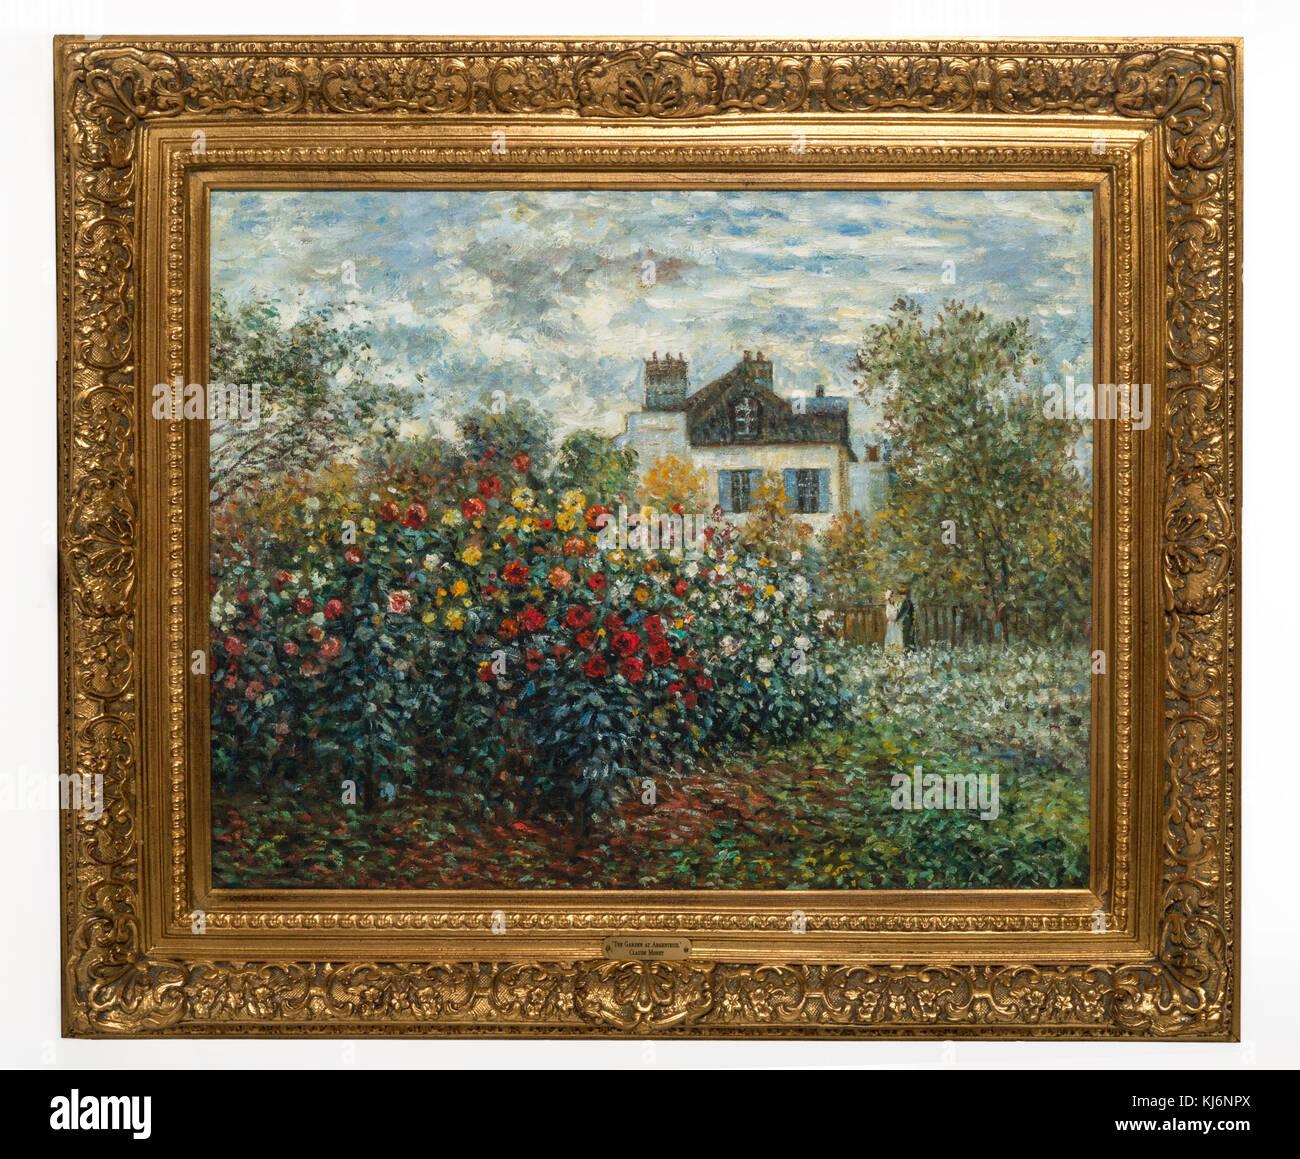 Monet Garden Painting Stock Photos & Monet Garden Painting Stock ...